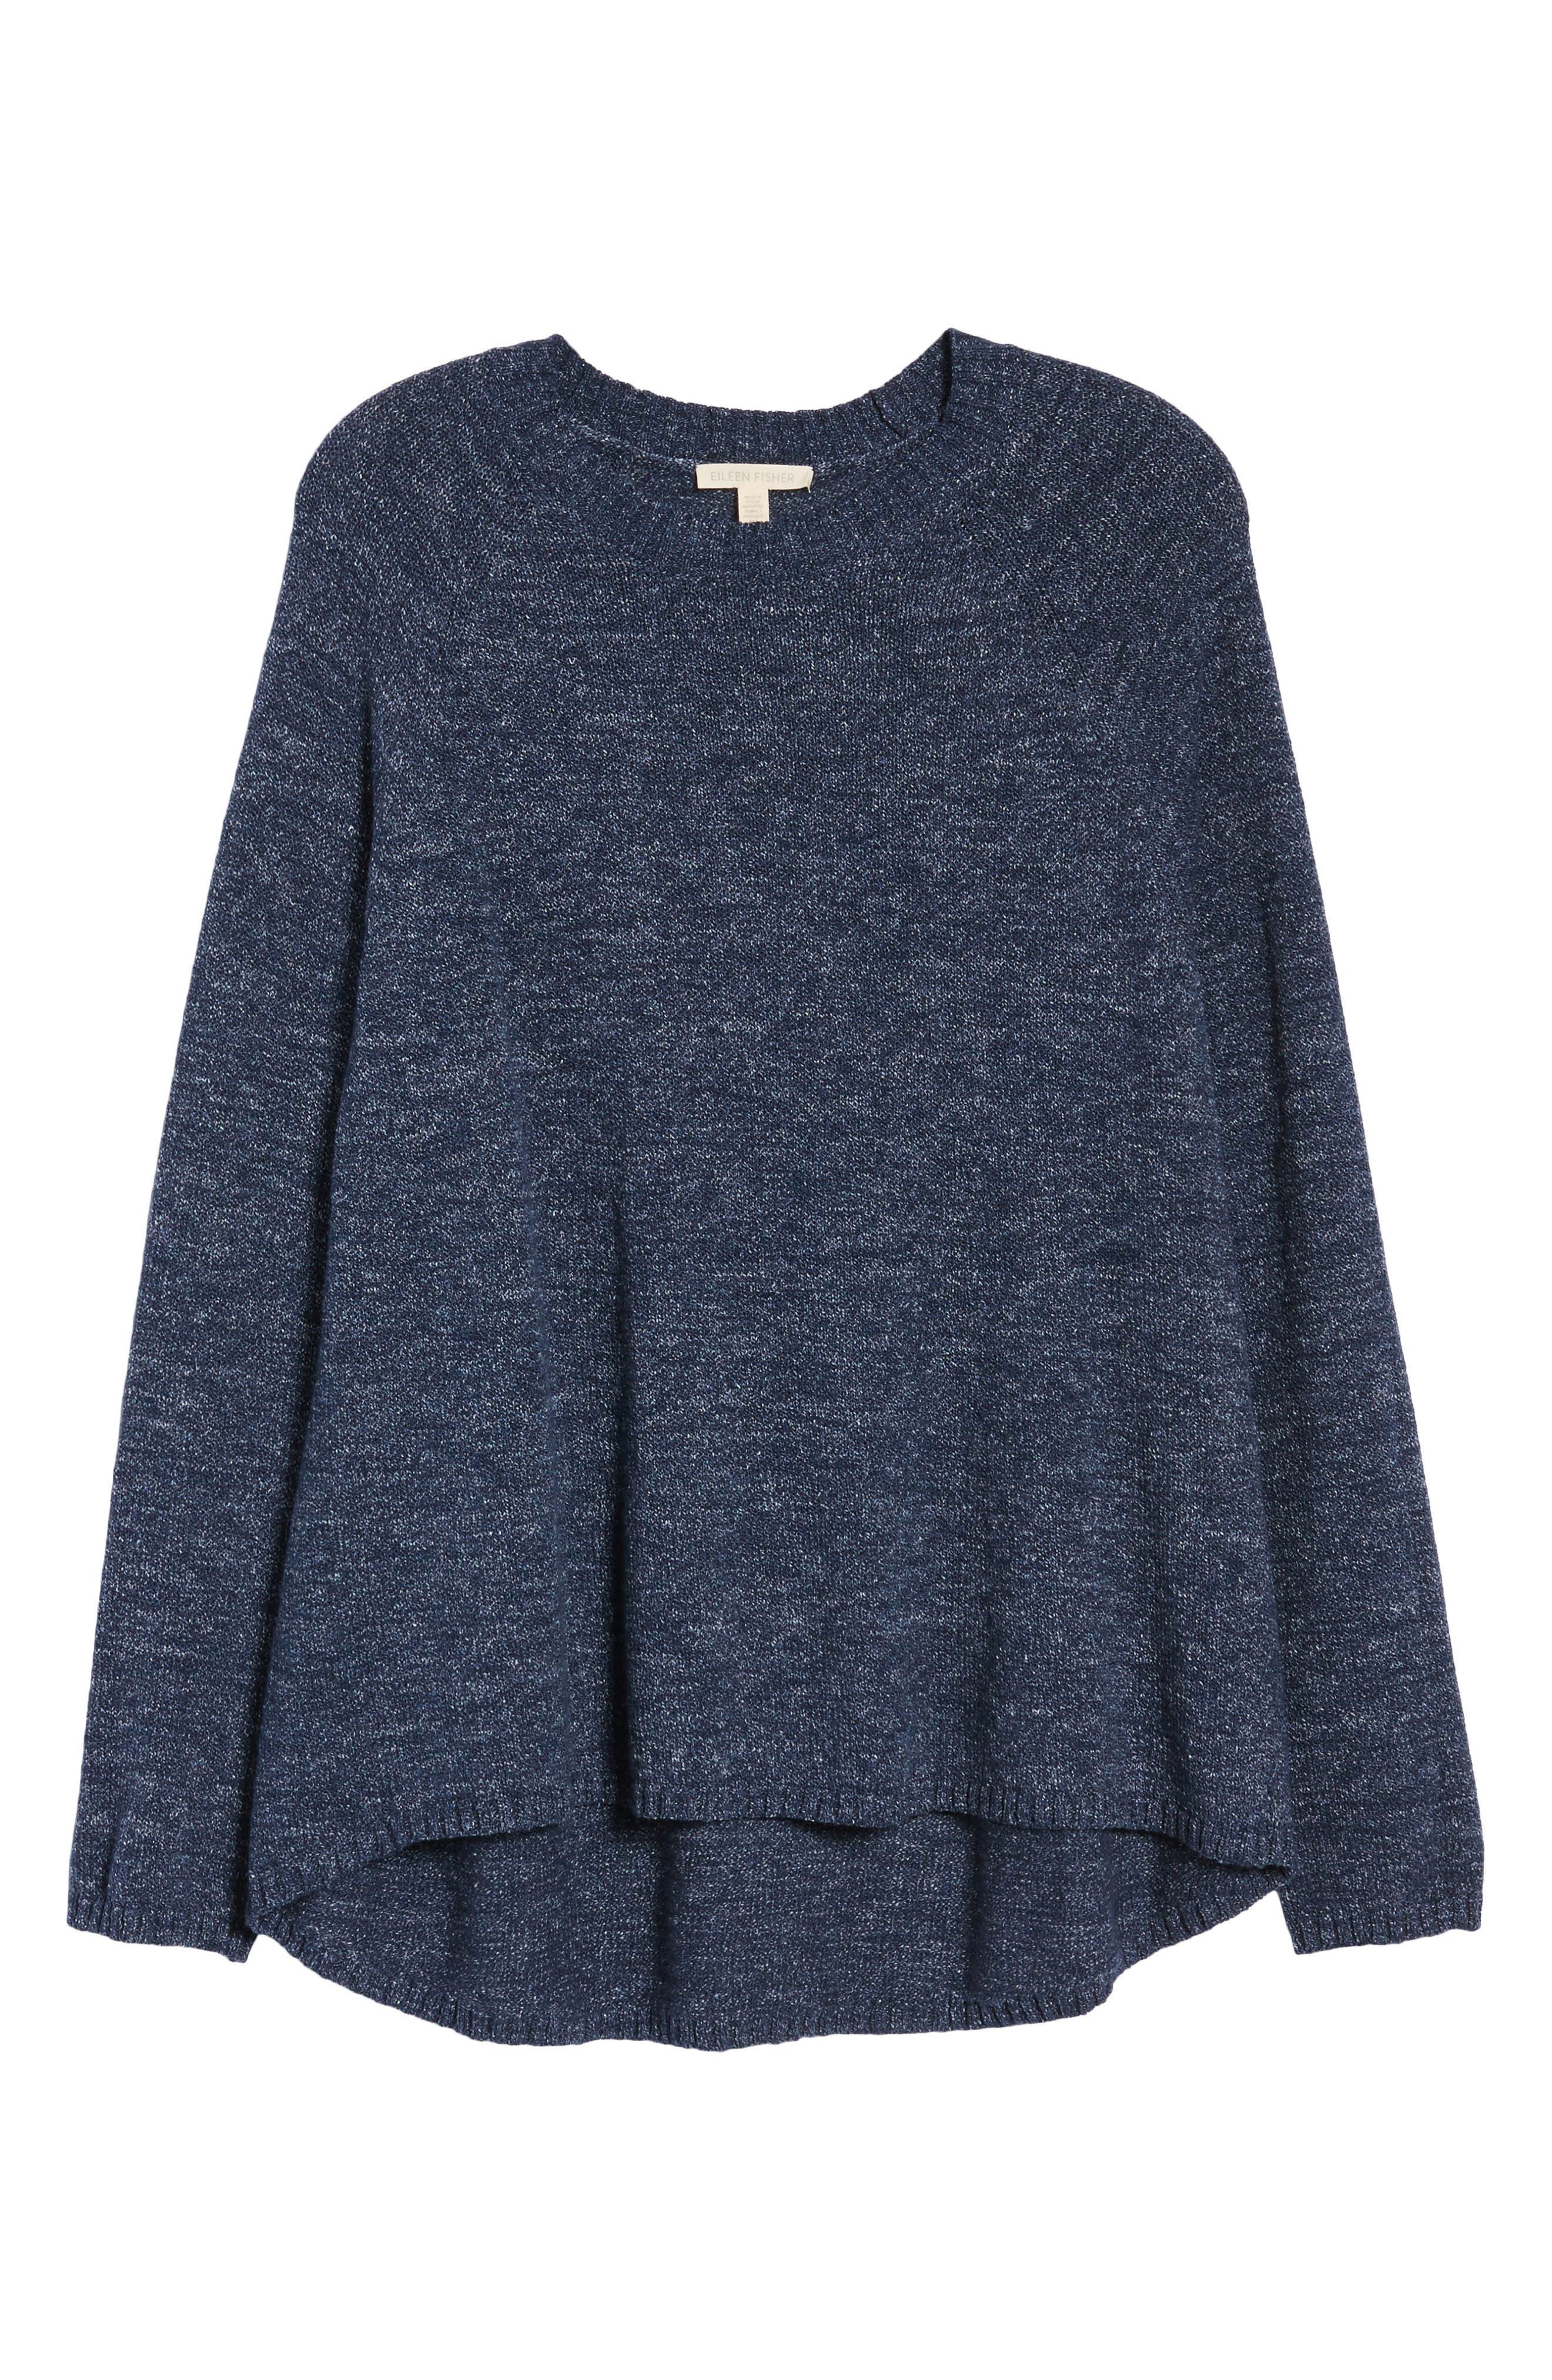 Organic Cotton Sweater,                             Alternate thumbnail 7, color,                             480